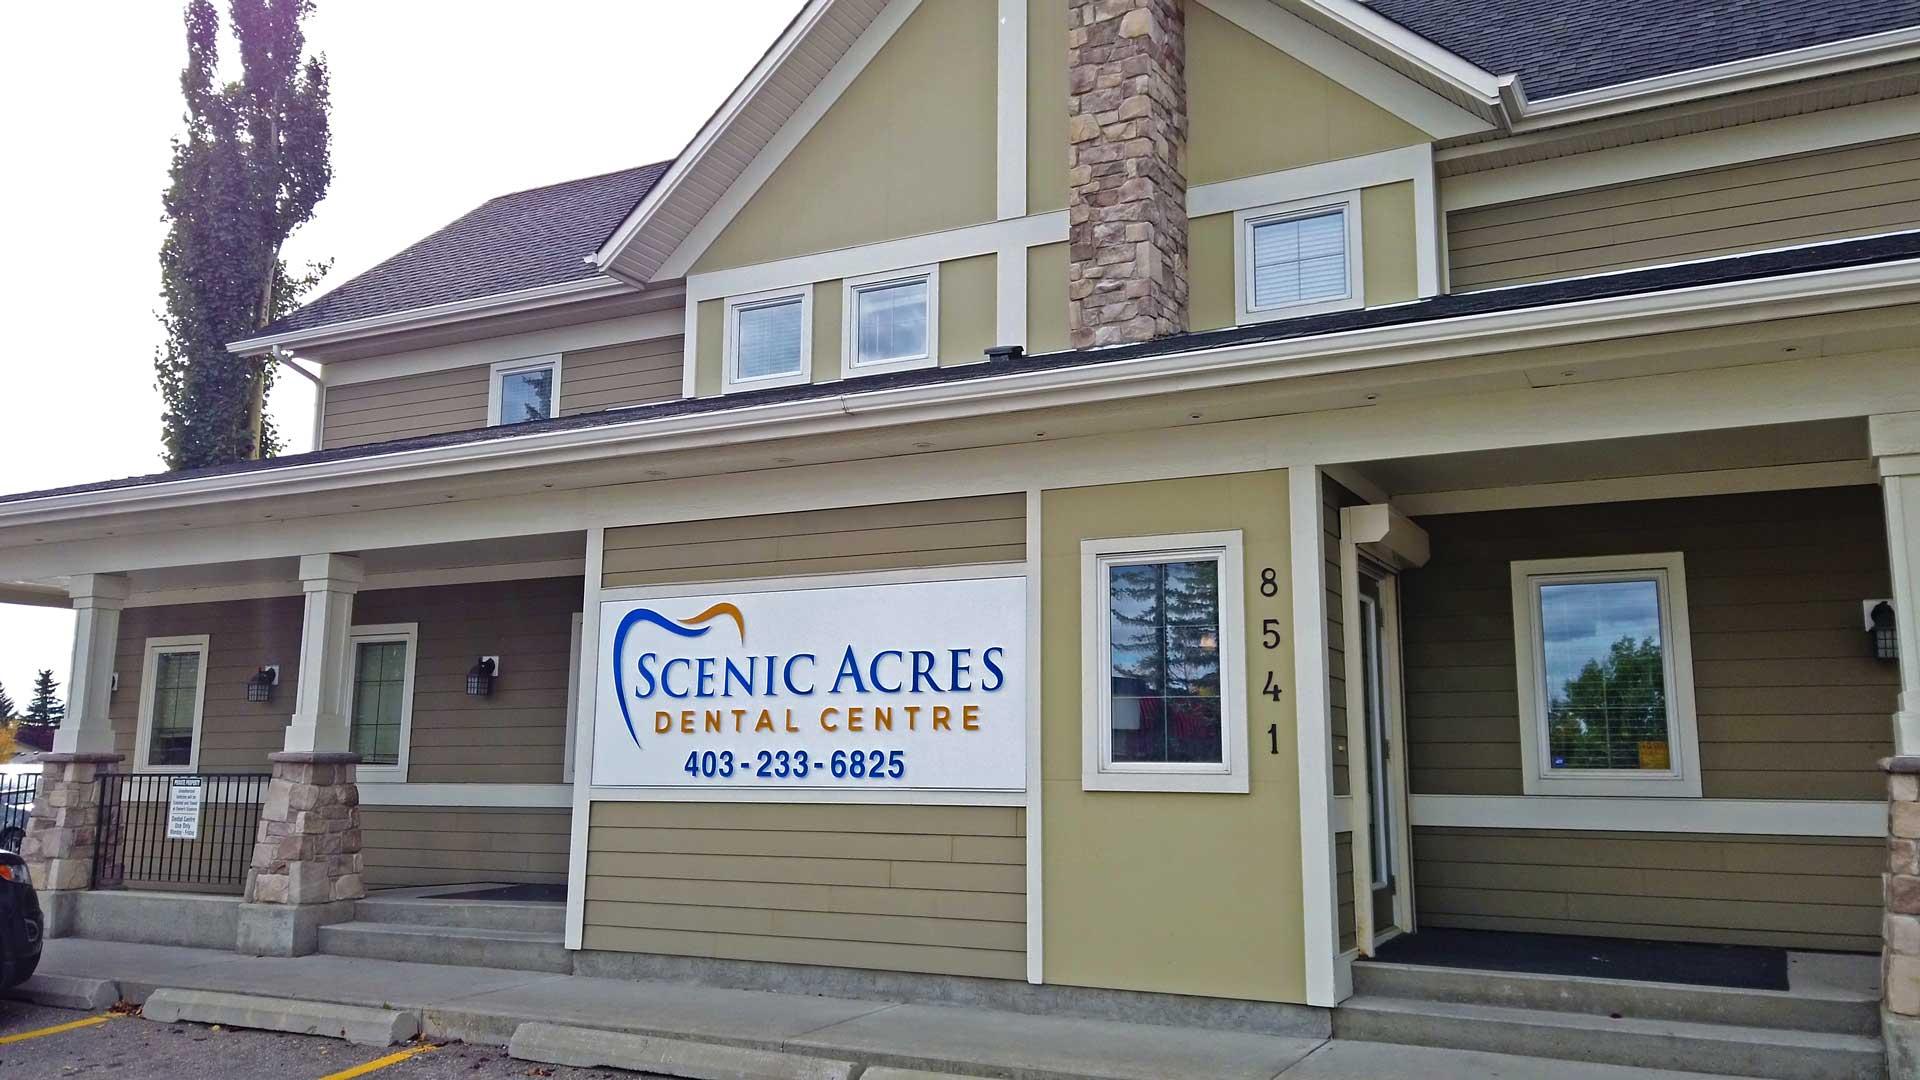 Scenic Acres Dental Centre